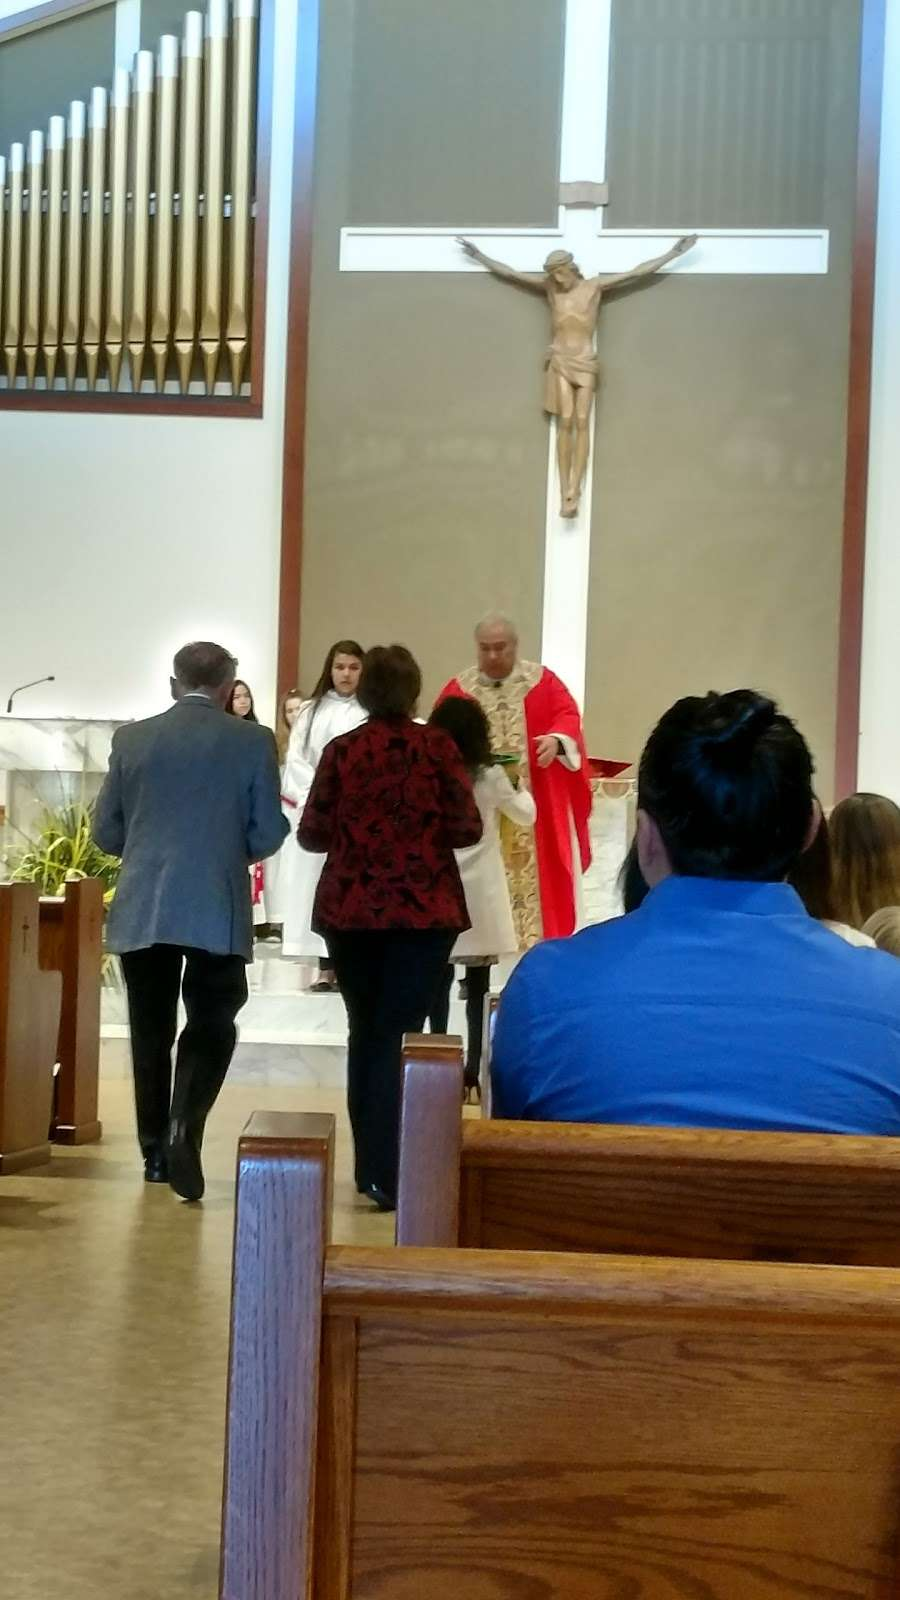 St. Margarets of Cortona Church - church  | Photo 2 of 10 | Address: 31 Chamberlain Ave, Little Ferry, NJ 07643, USA | Phone: (201) 641-2988